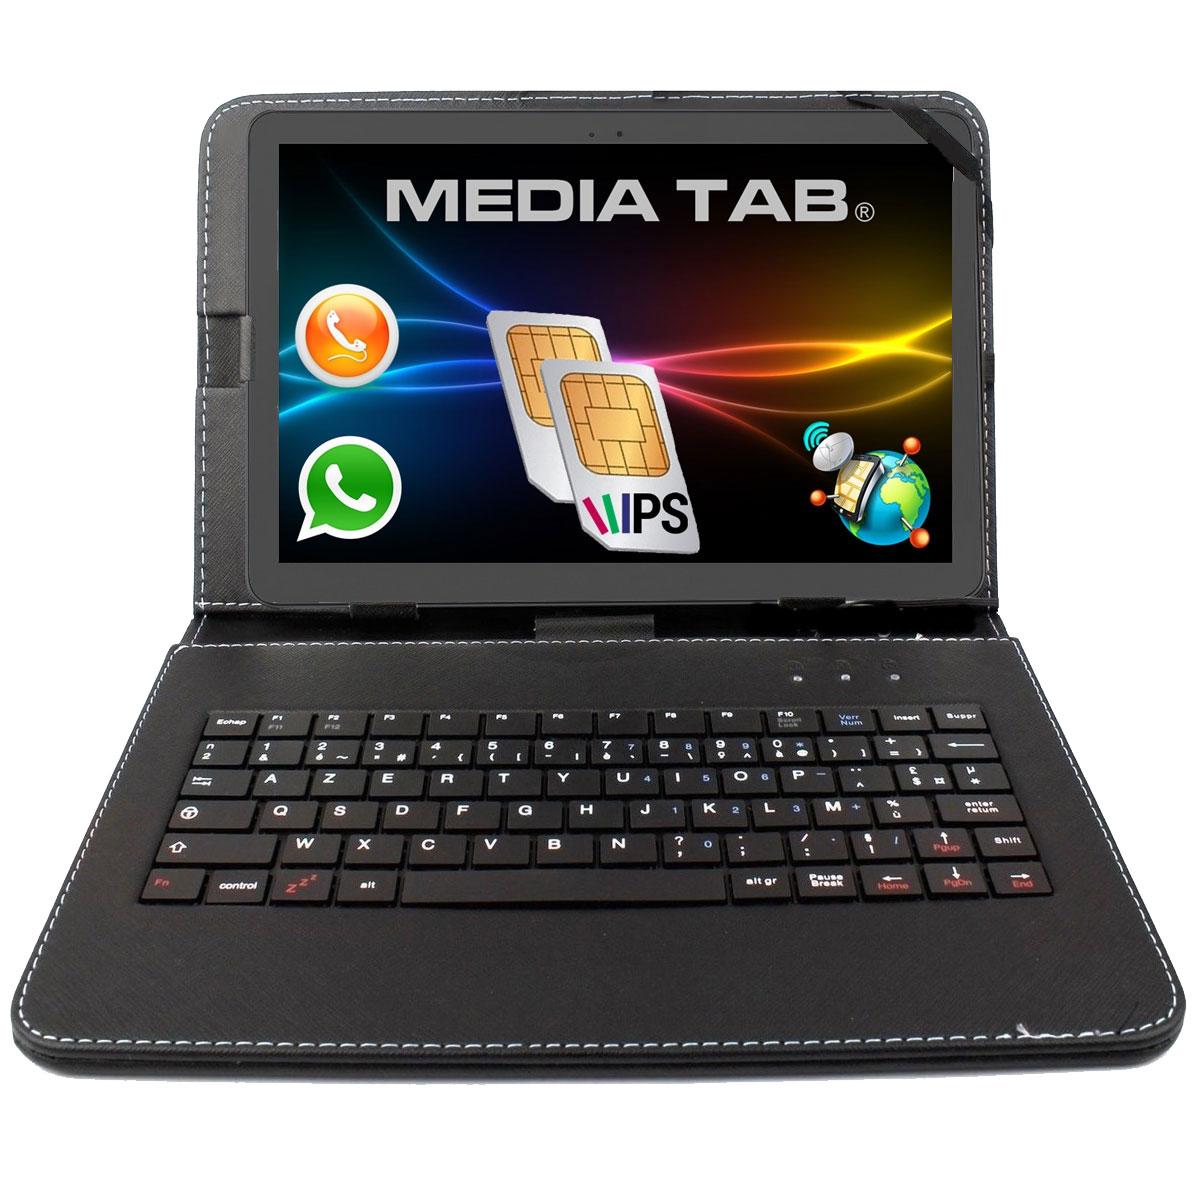 10-Zoll-Tablet-PC-3G-Dual-Sim-GPS-Android-7-0-64GB-2GB-RAM-HD-IPS-Display-uvm